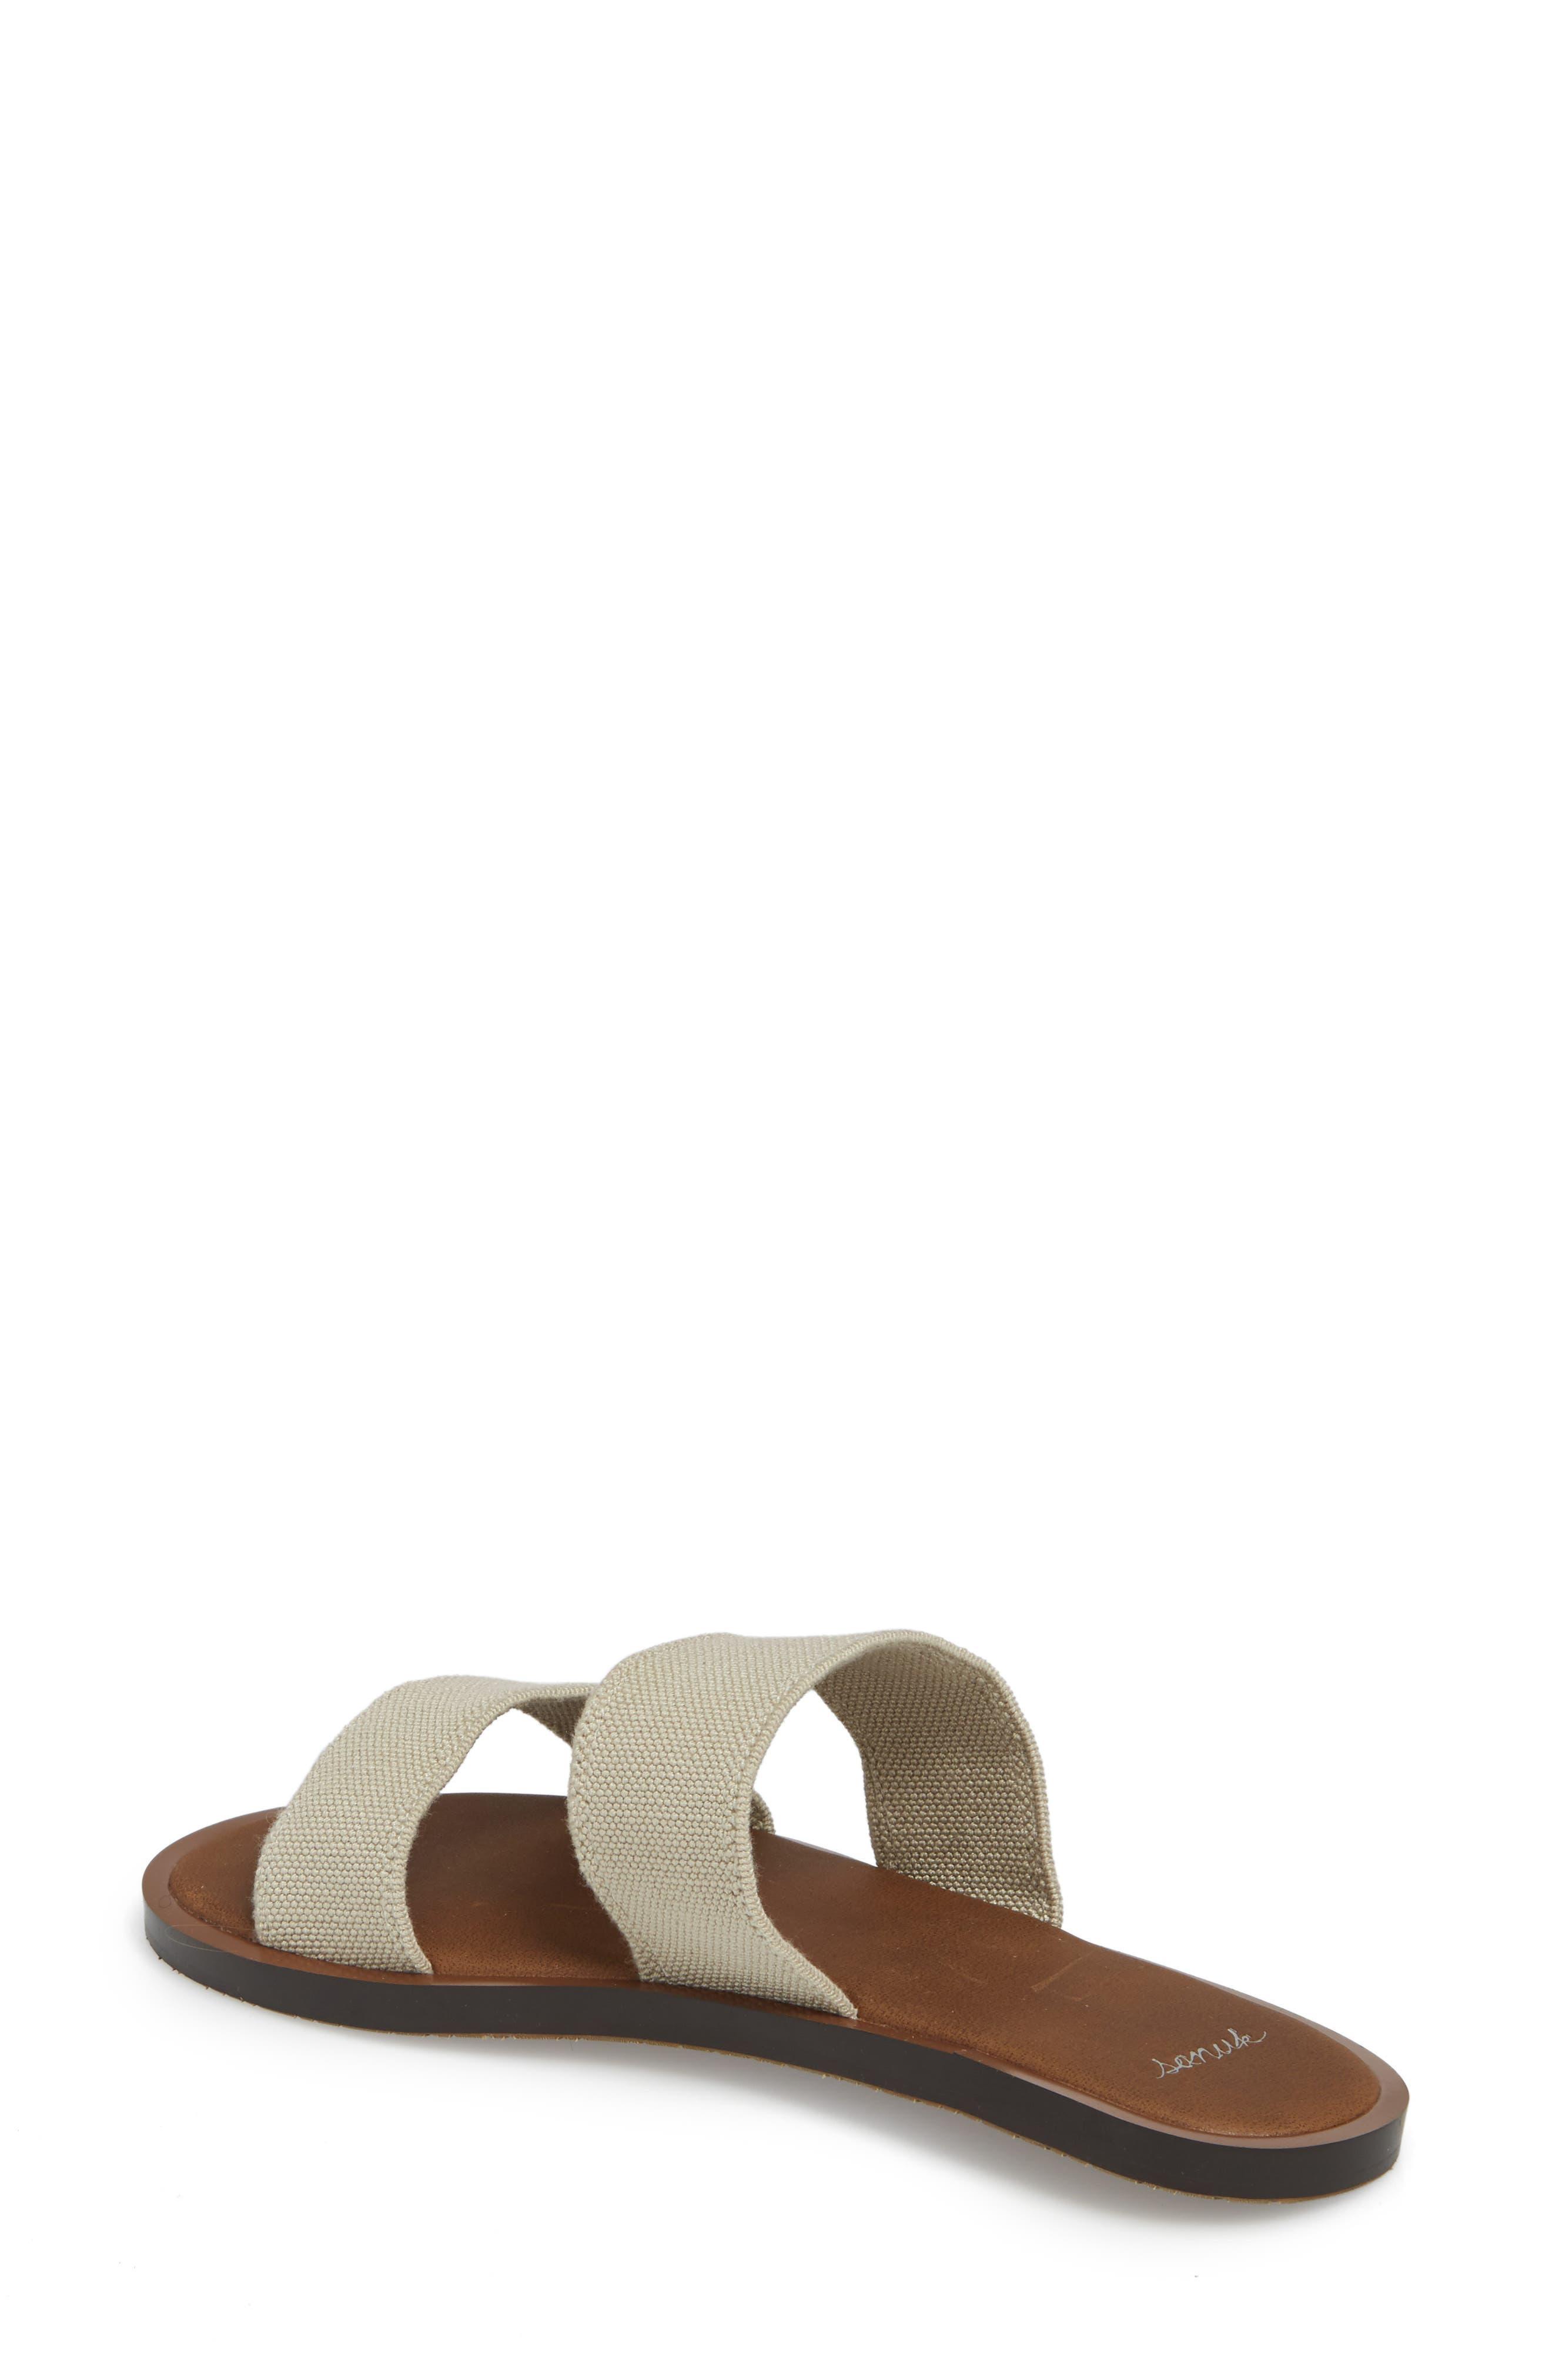 womens blk strappy women sandal s yoga flip sanuk mats snuk fashion sandals flop mat